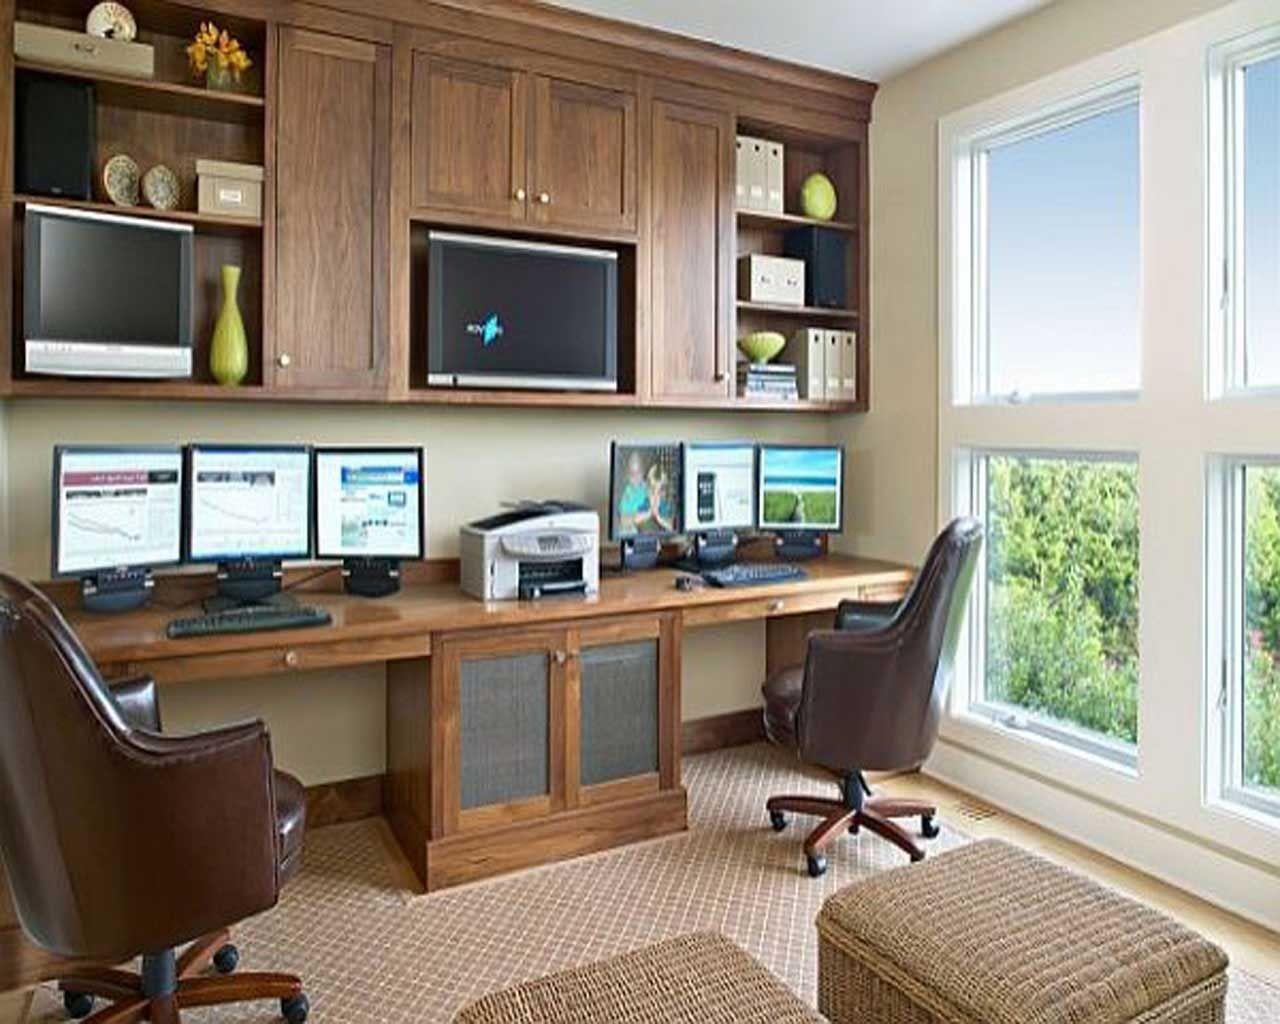 15 Charming Home Office Design Layout Ideas Home Office Layouts Office Furniture Design Office Furniture Arrangement